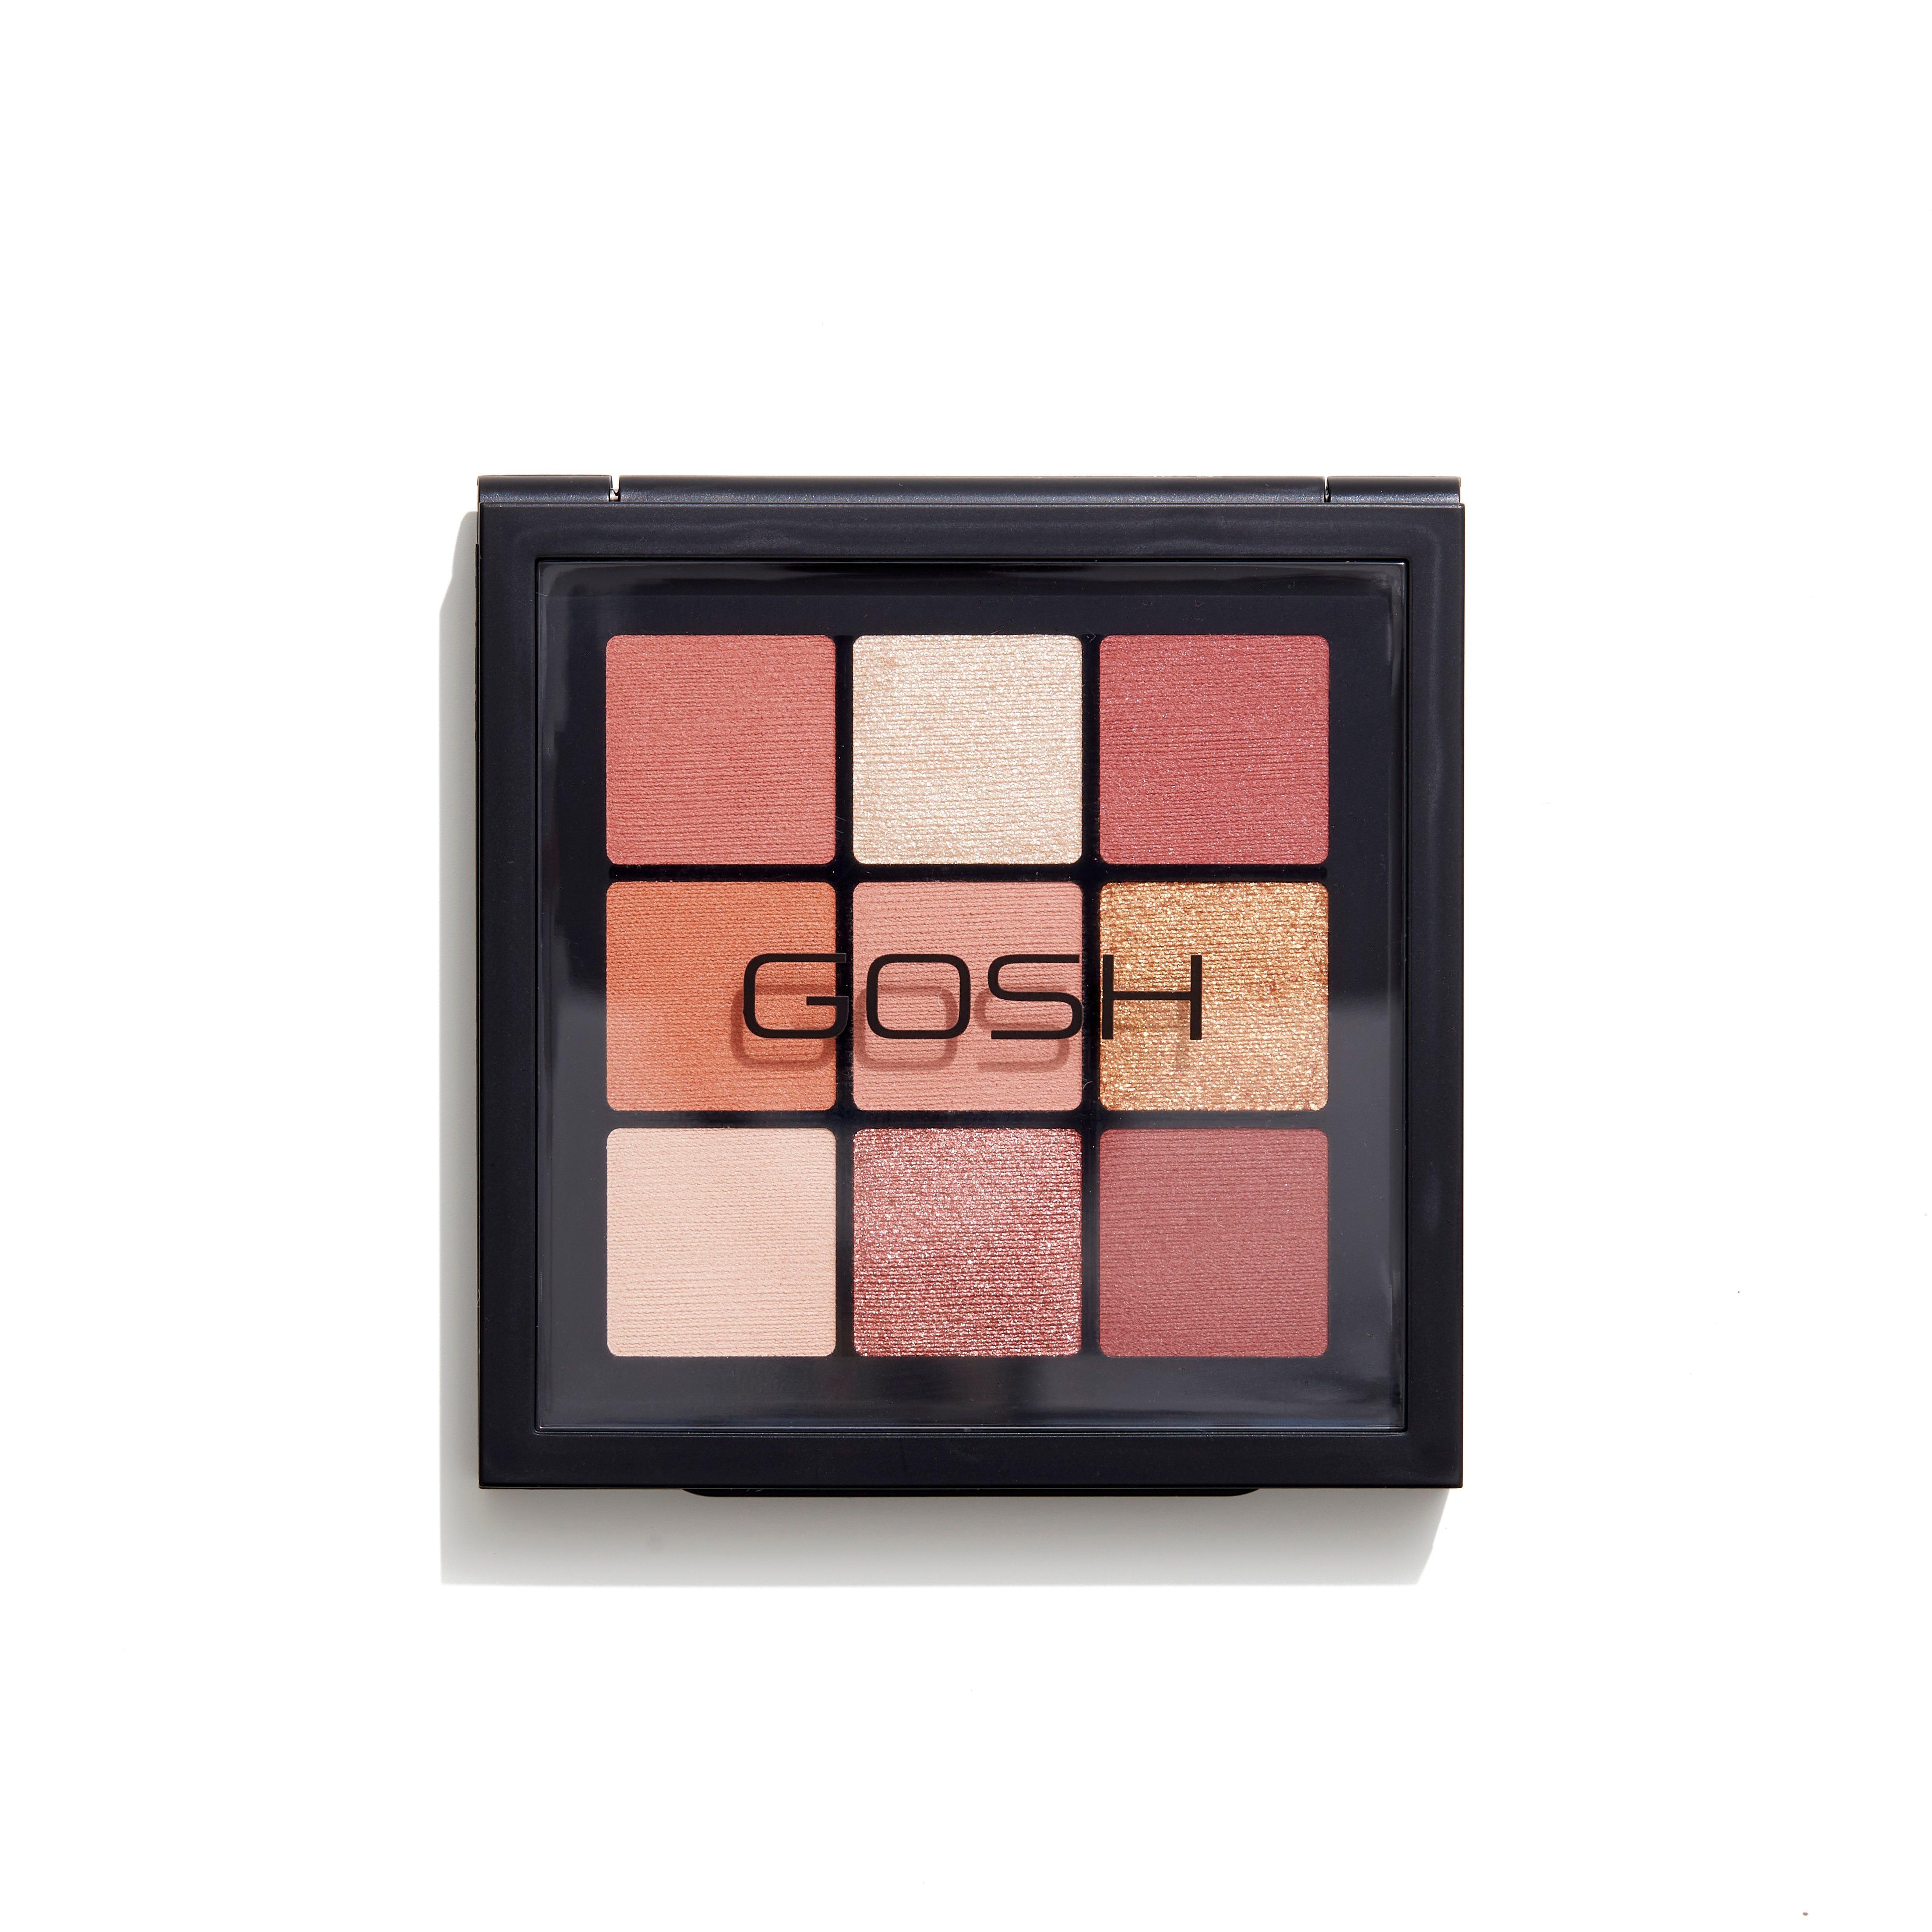 GOSH Copenhagen - Eyedentity Palette - 002 Be Humble